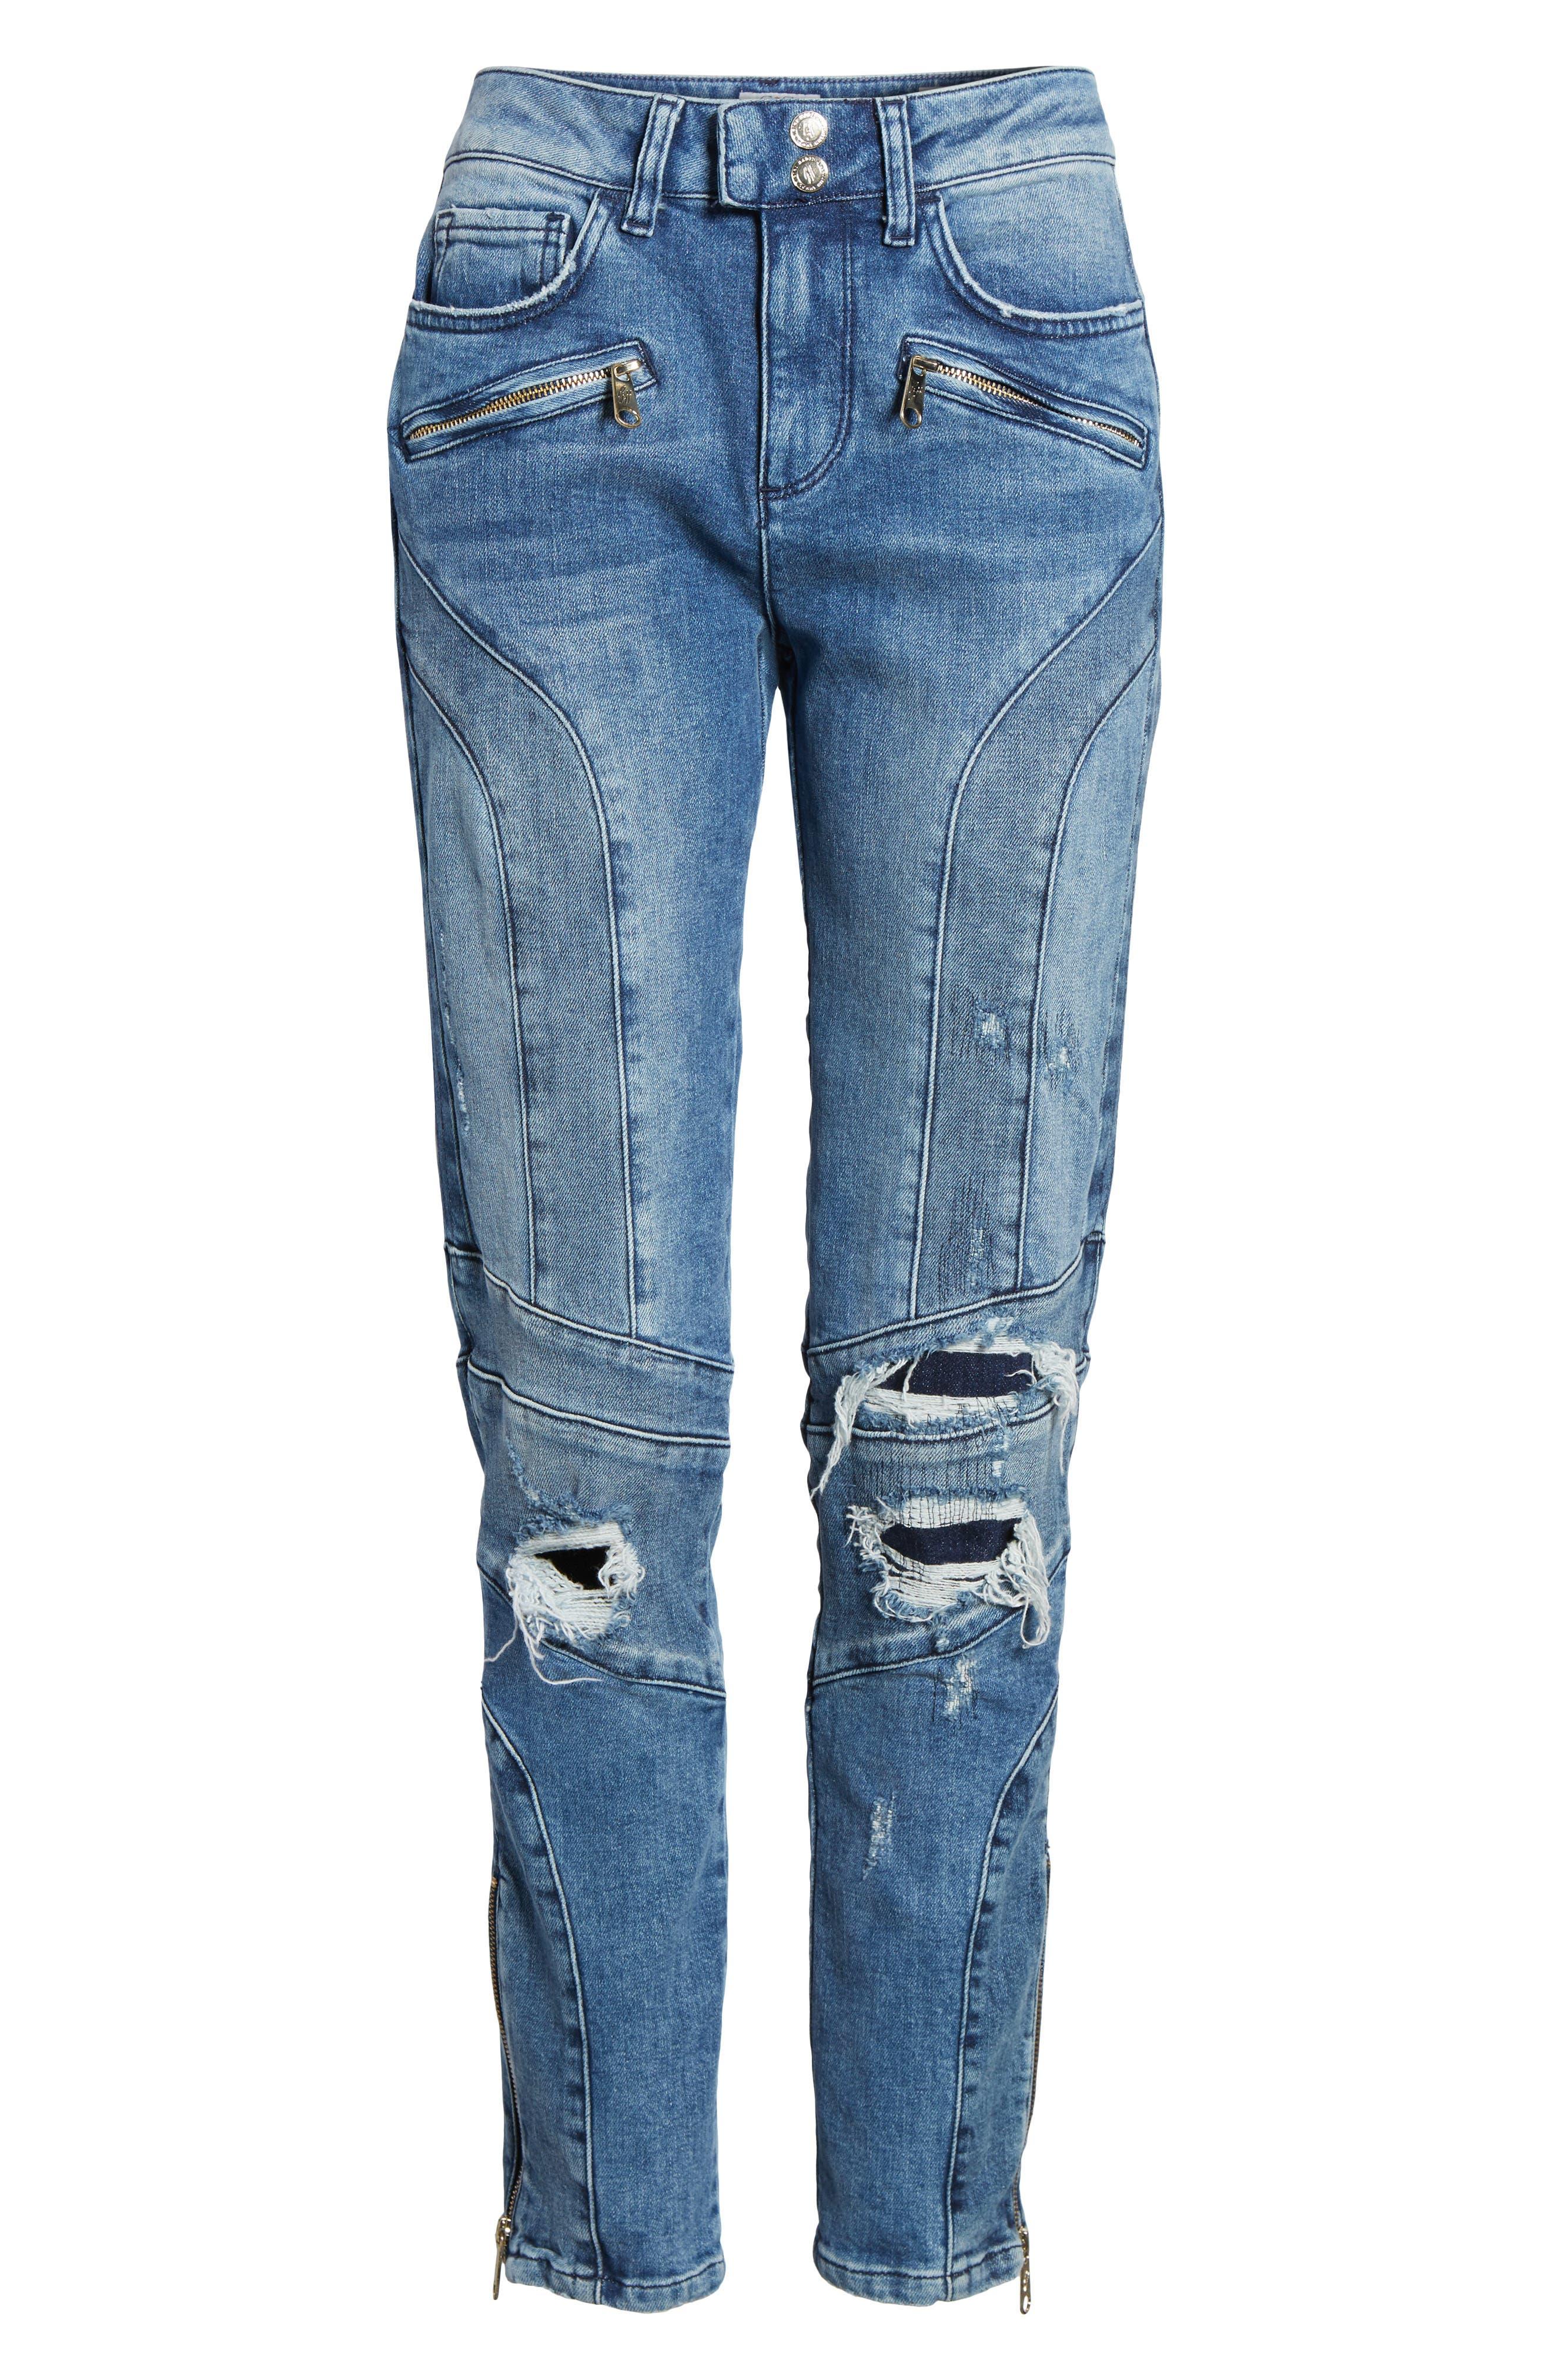 x Gigi Hadid Speed Distressed Ankle Zip Jeans,                             Alternate thumbnail 7, color,                             Mid Blue